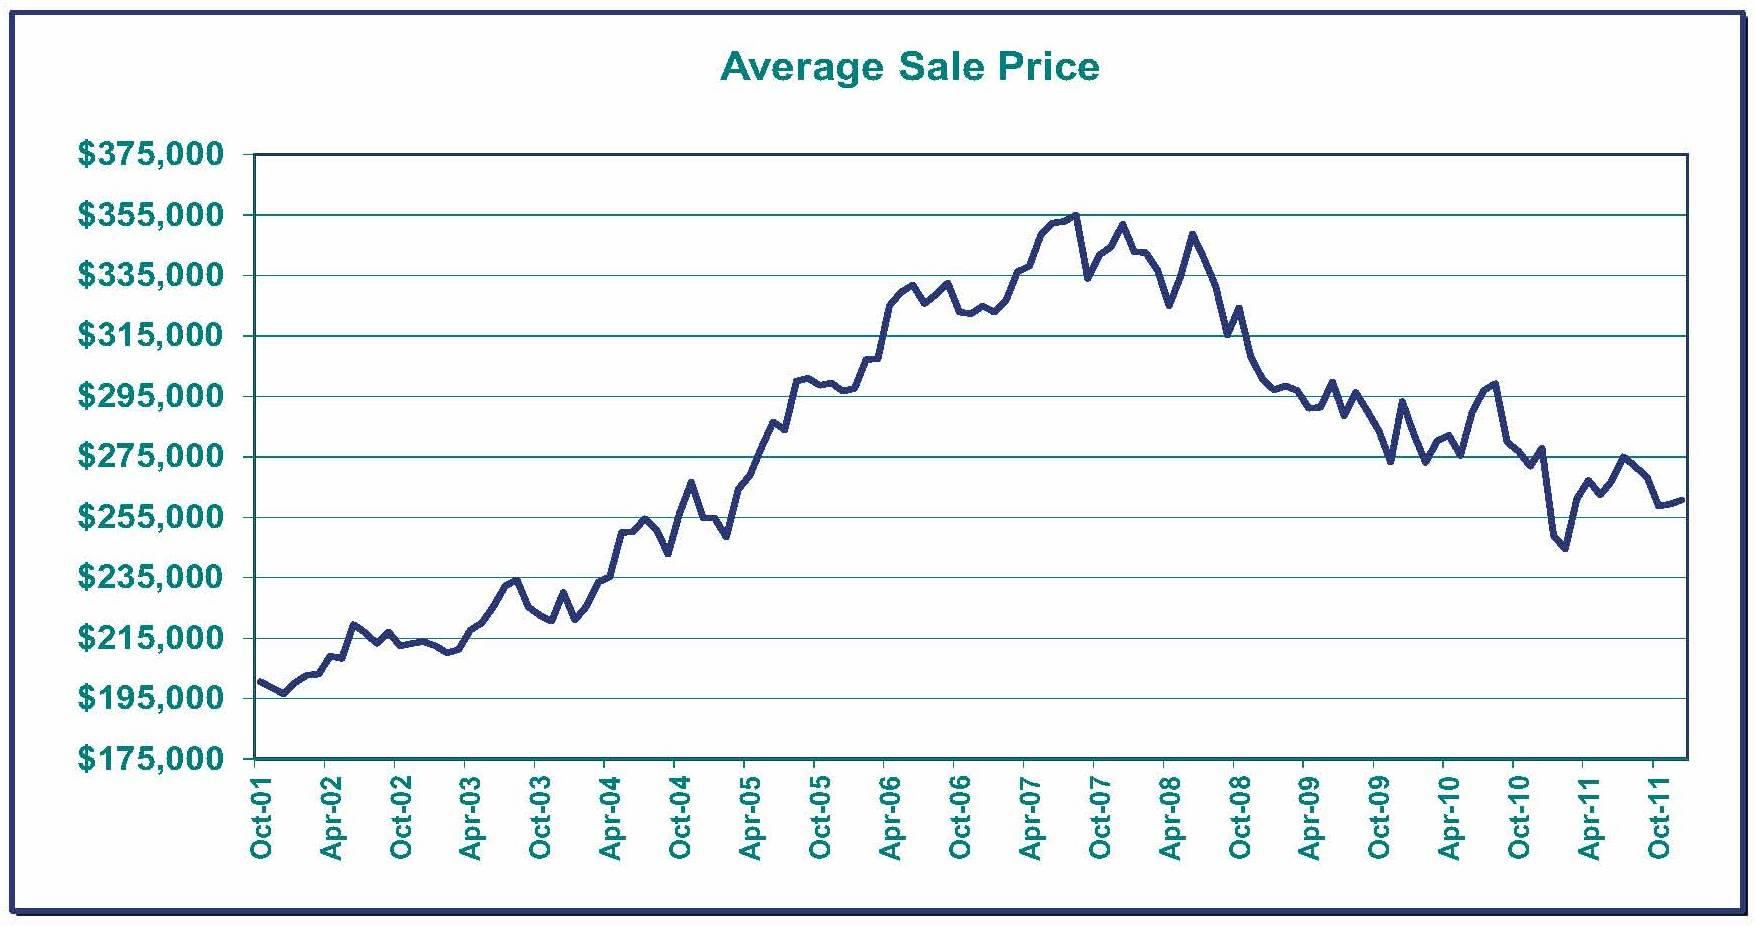 Average Sale Price 2011